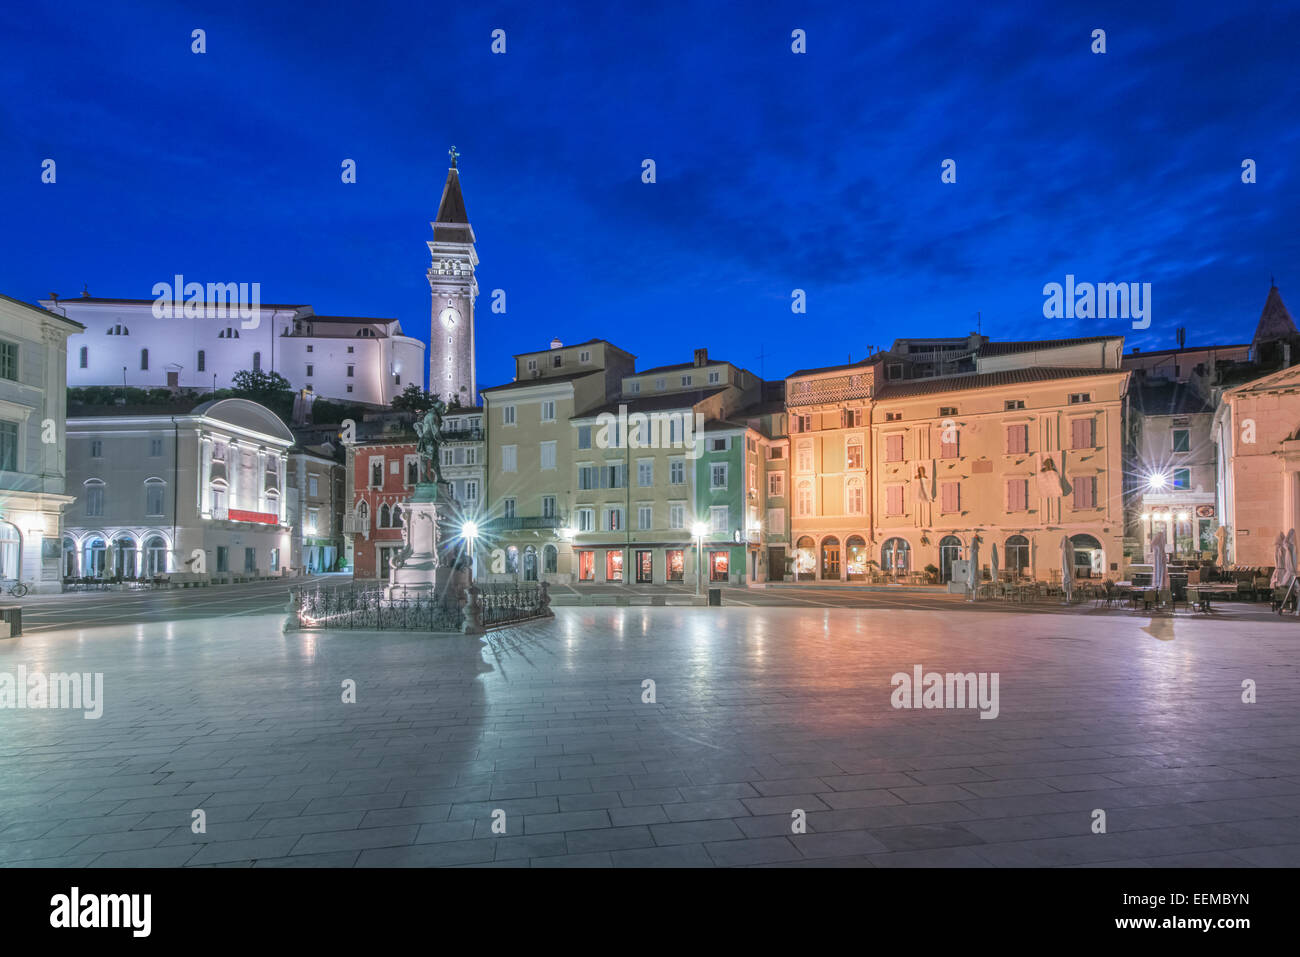 Town square, tower and buildings illuminated at night, Piran, Coastal-Karst, Slovenia - Stock Image